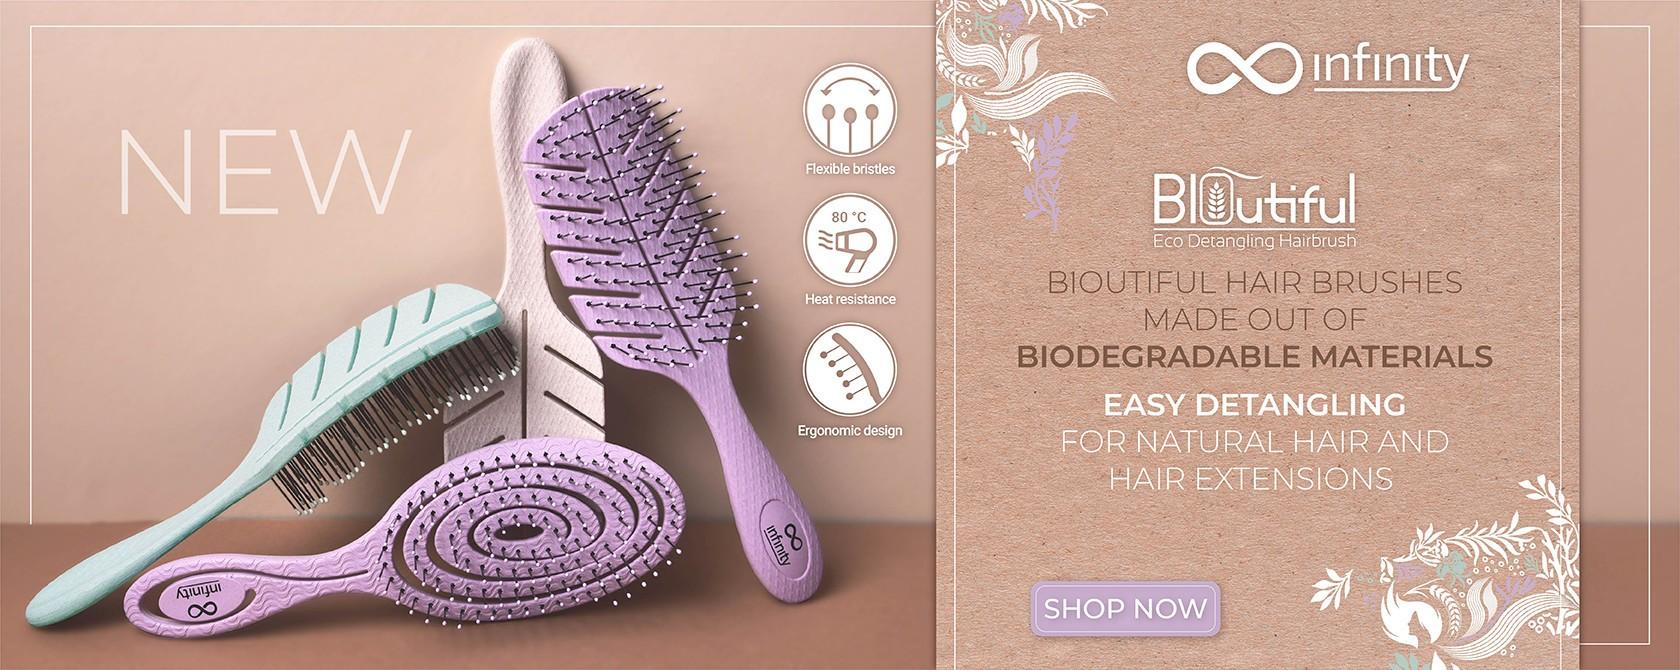 INFINITY BIOutiful brushes